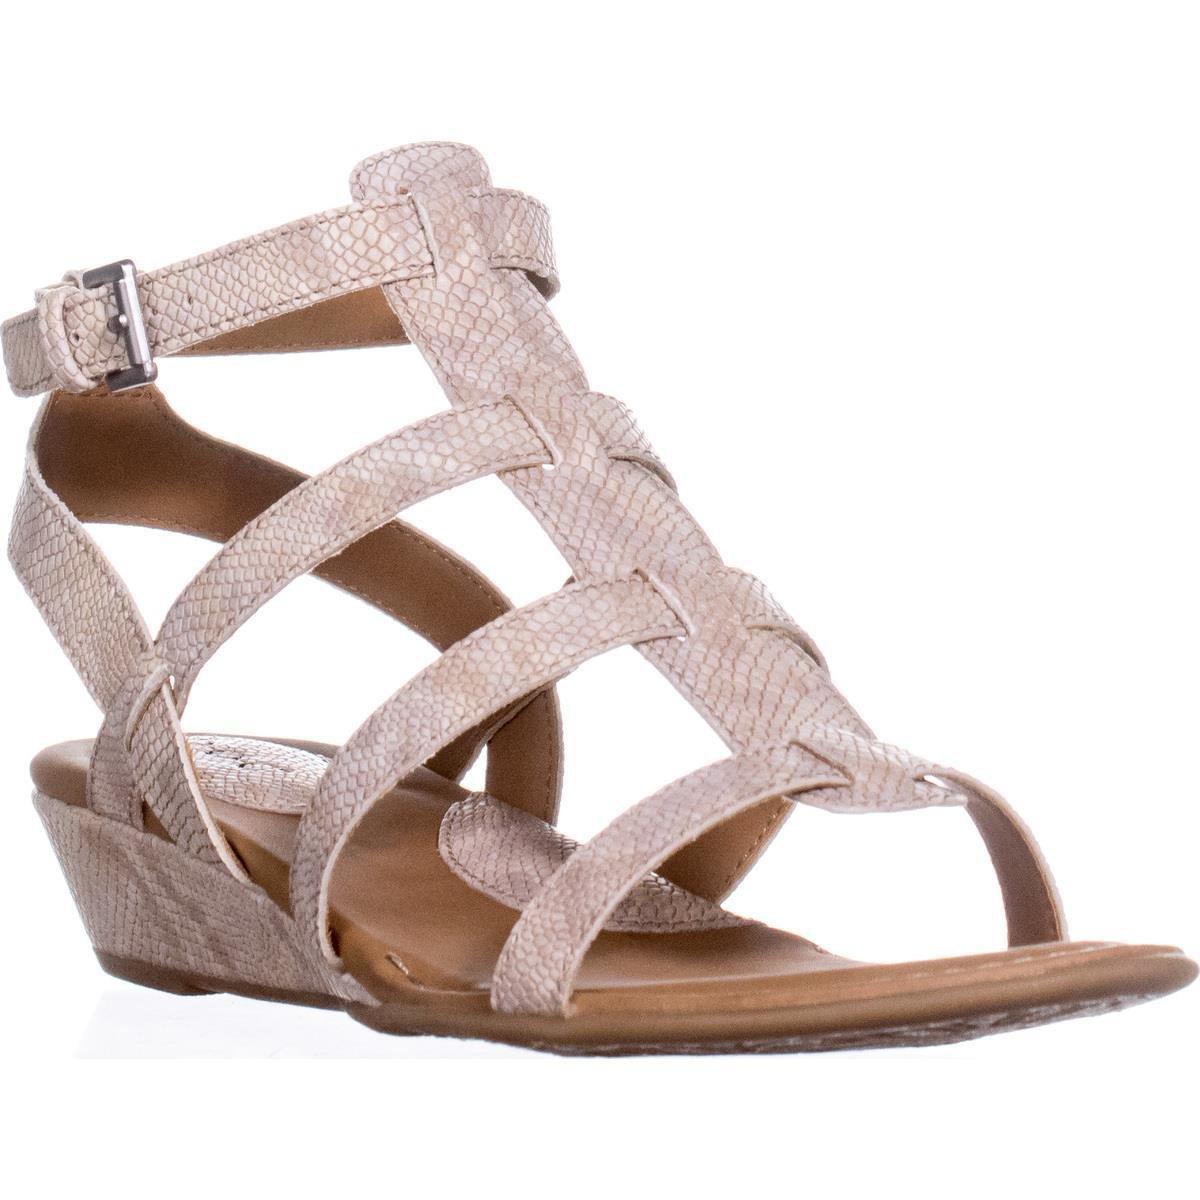 5f4ee31259a3 Born womens heidi open toe casual platform sandals cream size heeled sandals  jpg 1200x1200 Born sandels